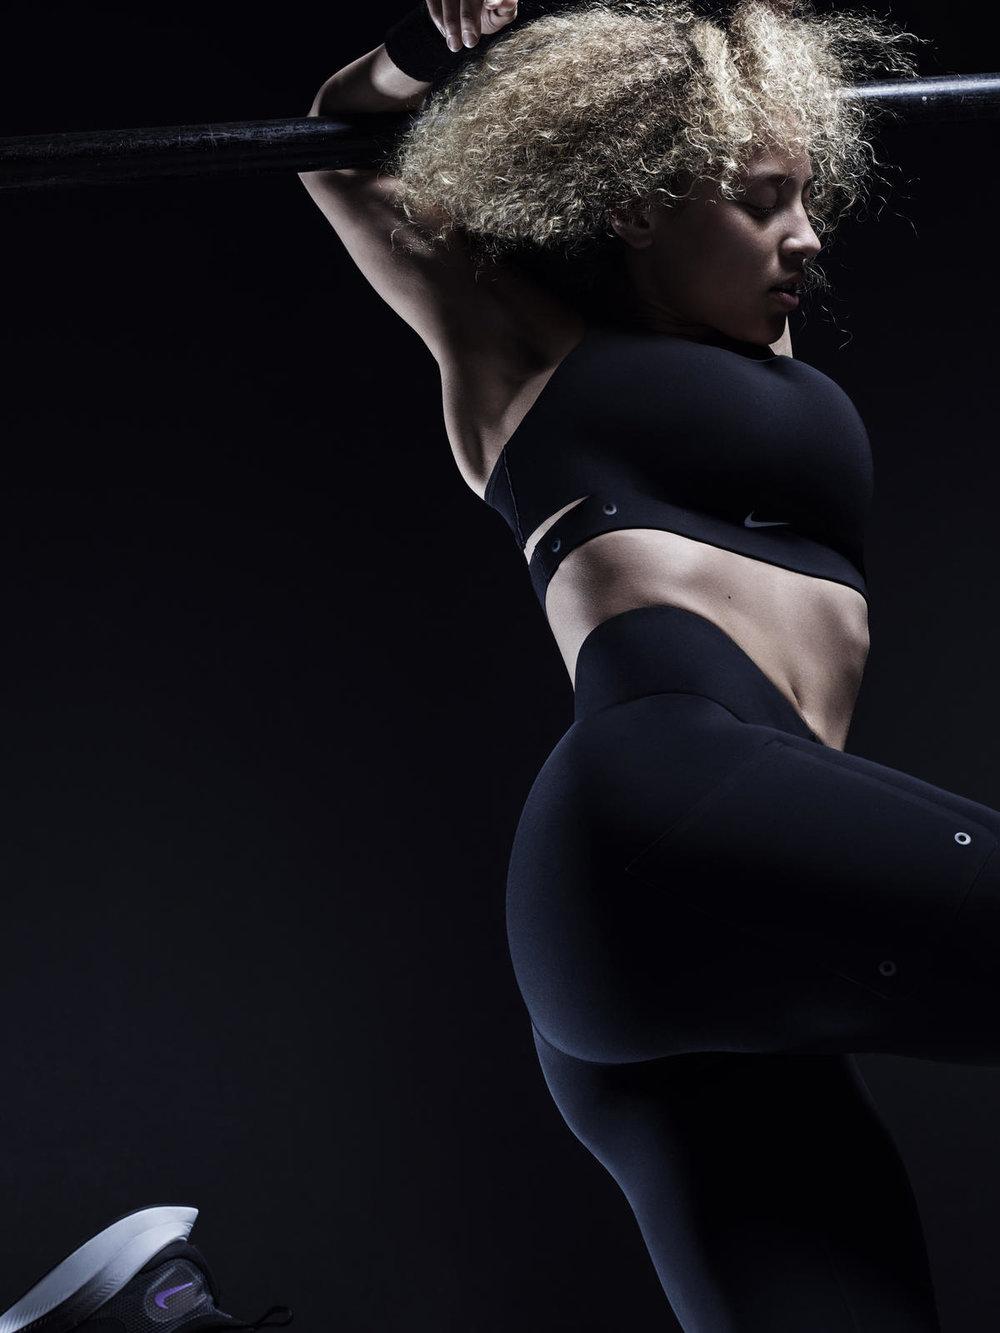 Nike-City-Ready-03_81050_81092.jpg